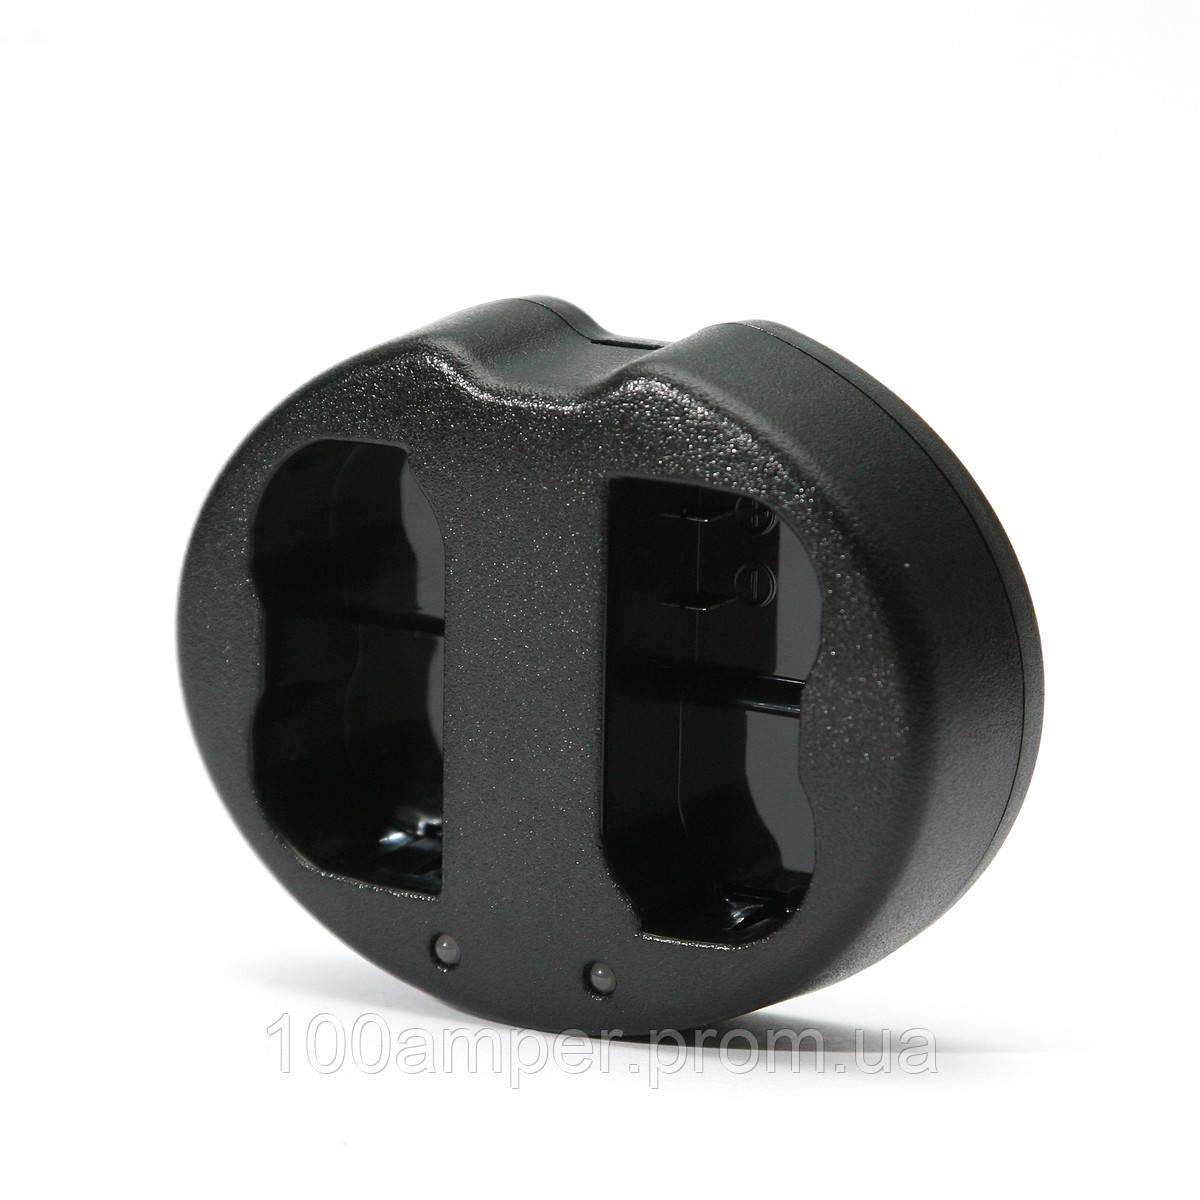 Зарядное устройство PowerPlant Dual Nikon EN-EL14 для двух аккумуляторов